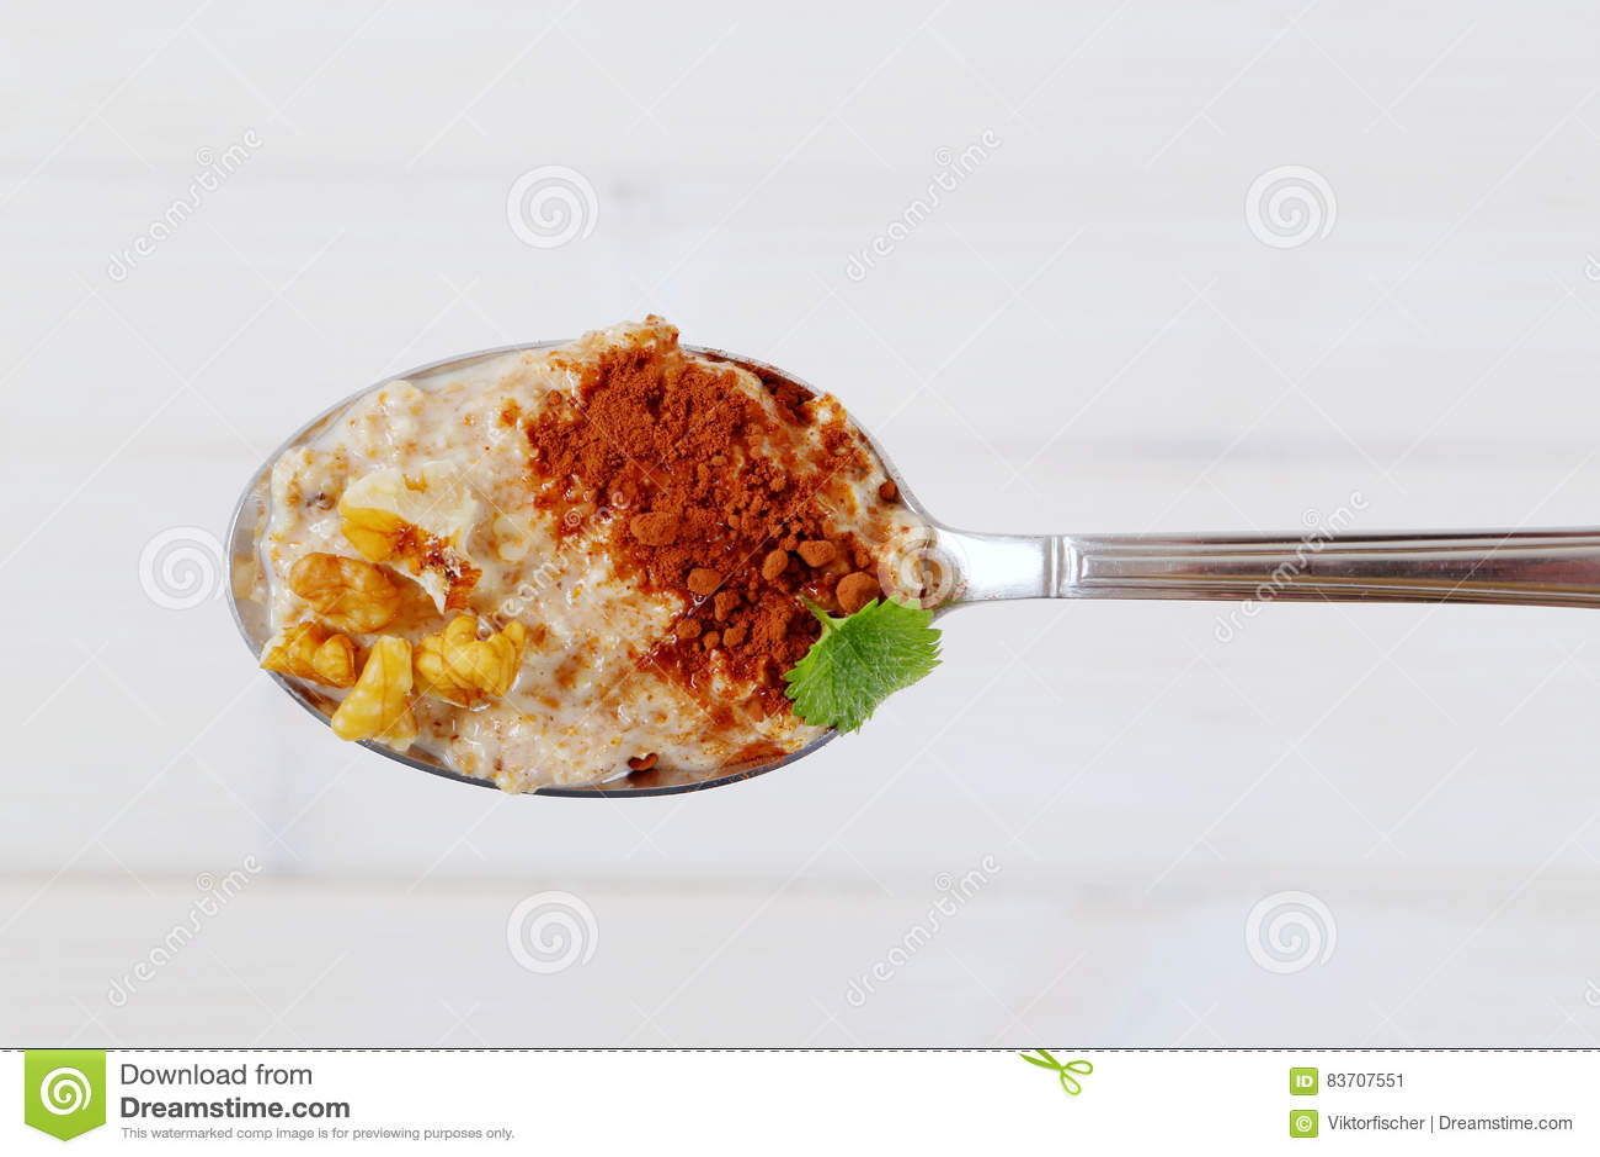 Spoon Of Oatmeal Porridge With Cinnamon And Walnuts Stock Photo